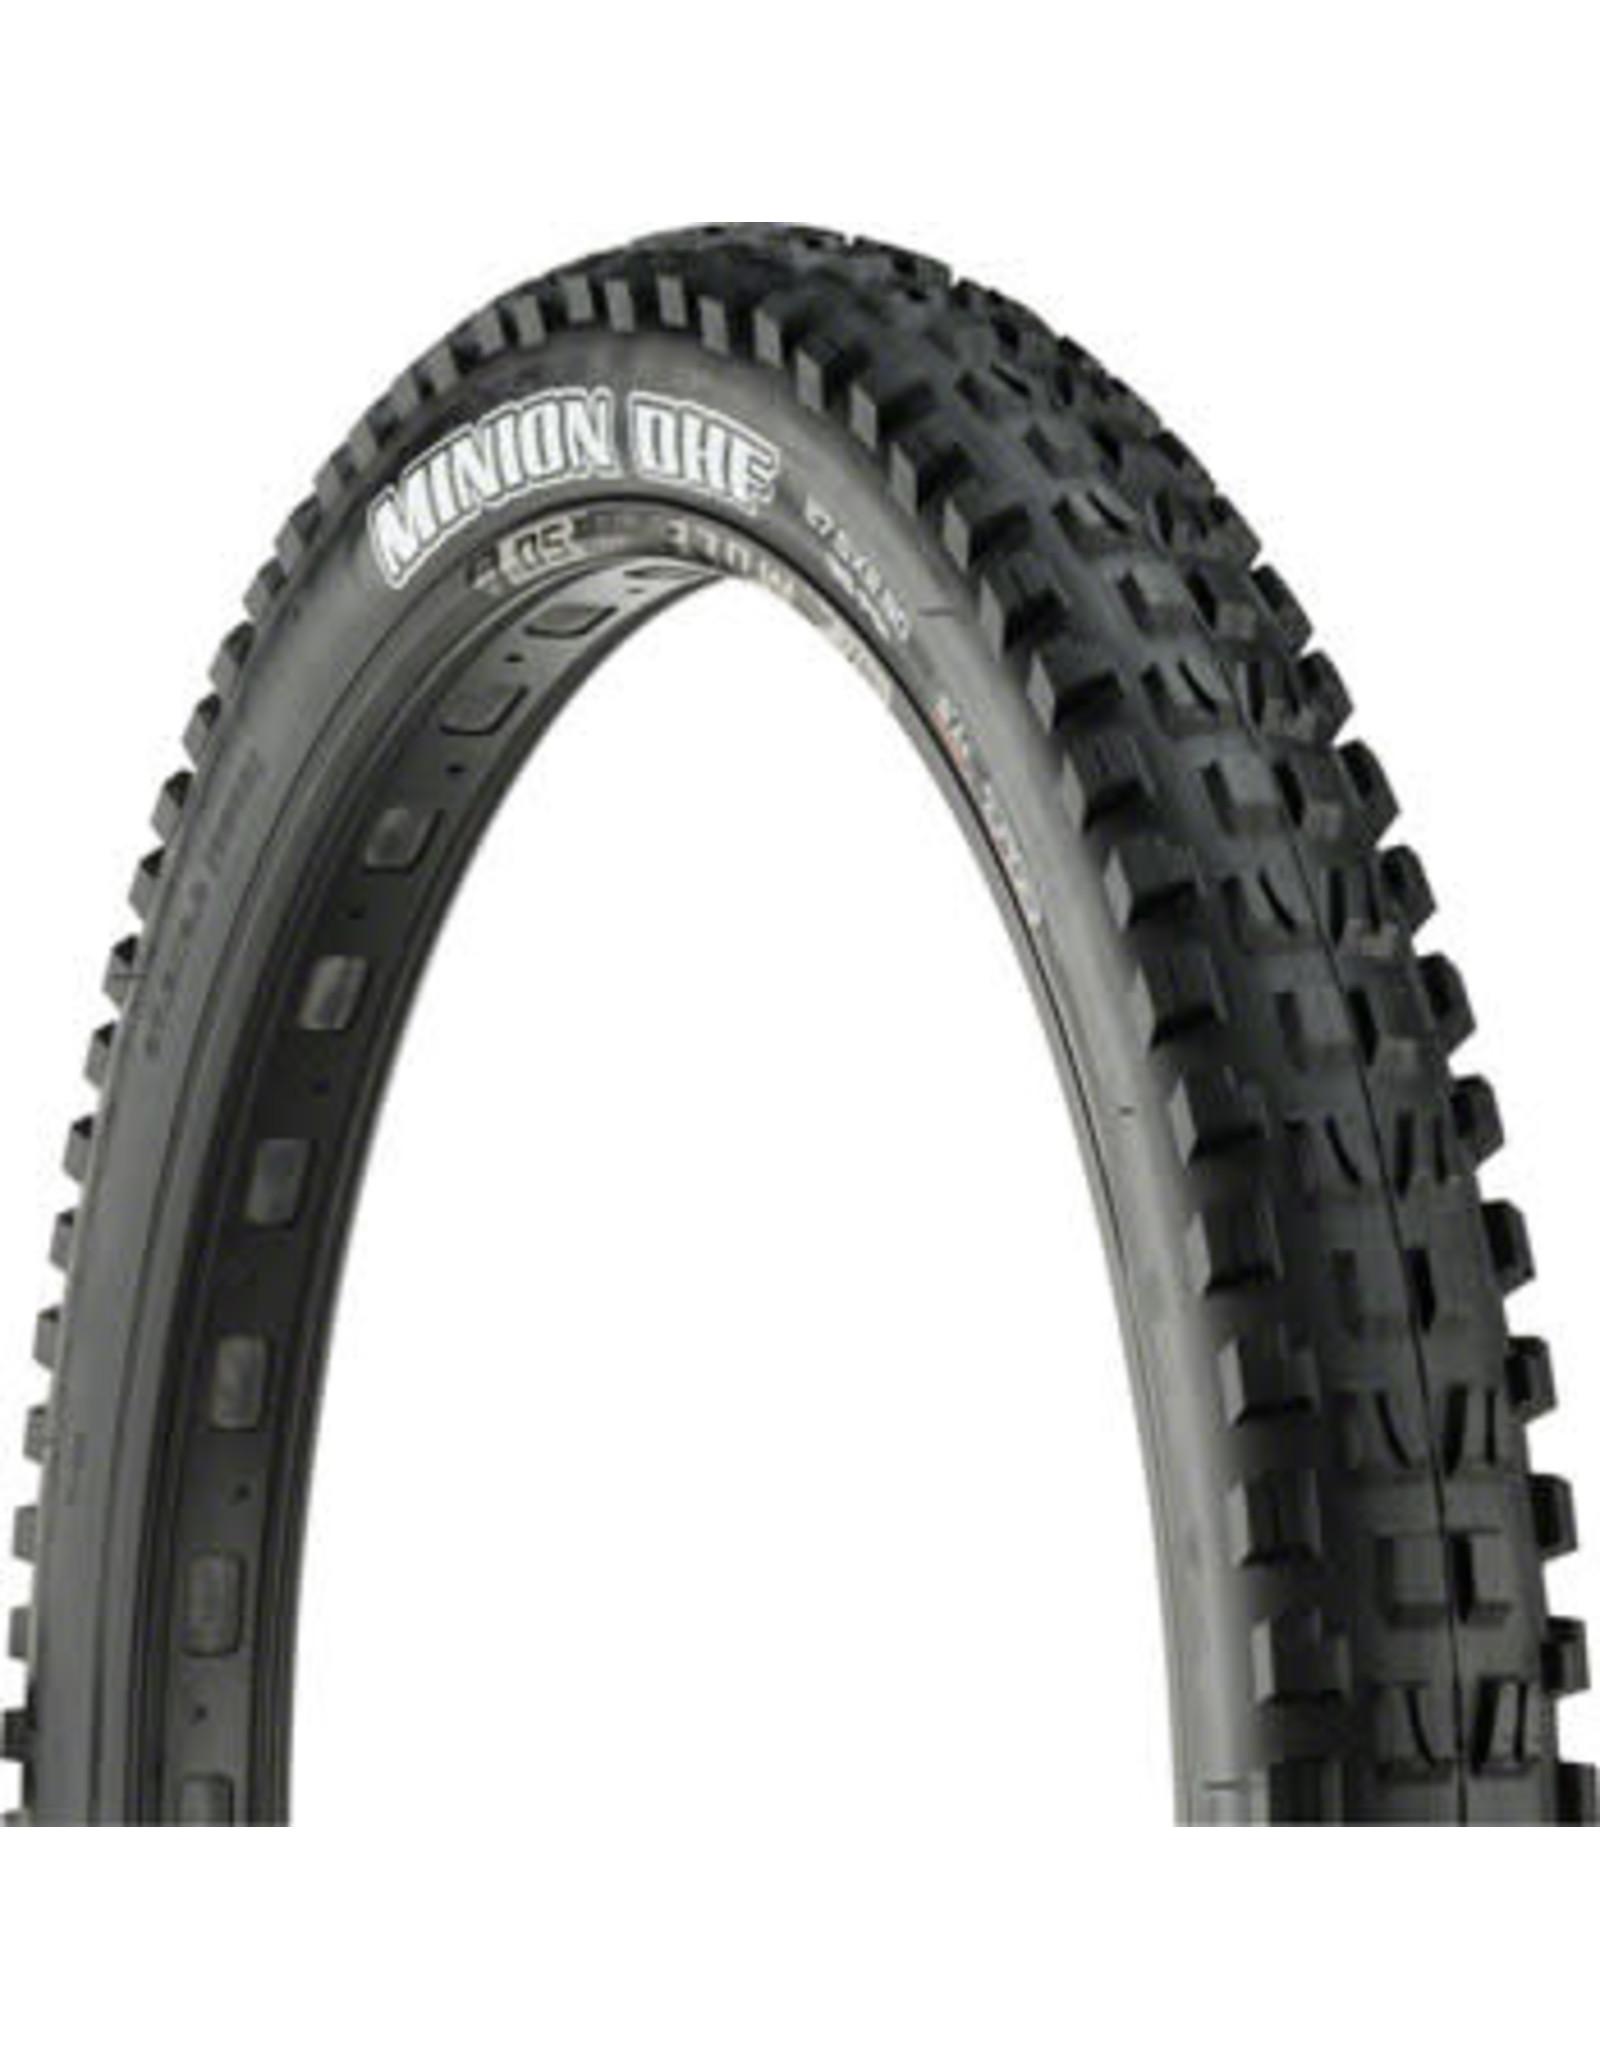 Maxxis Maxxis Minion DHF Tire - 27.5 x 2.8, Tubeless, Folding, Black, Dual, EXO